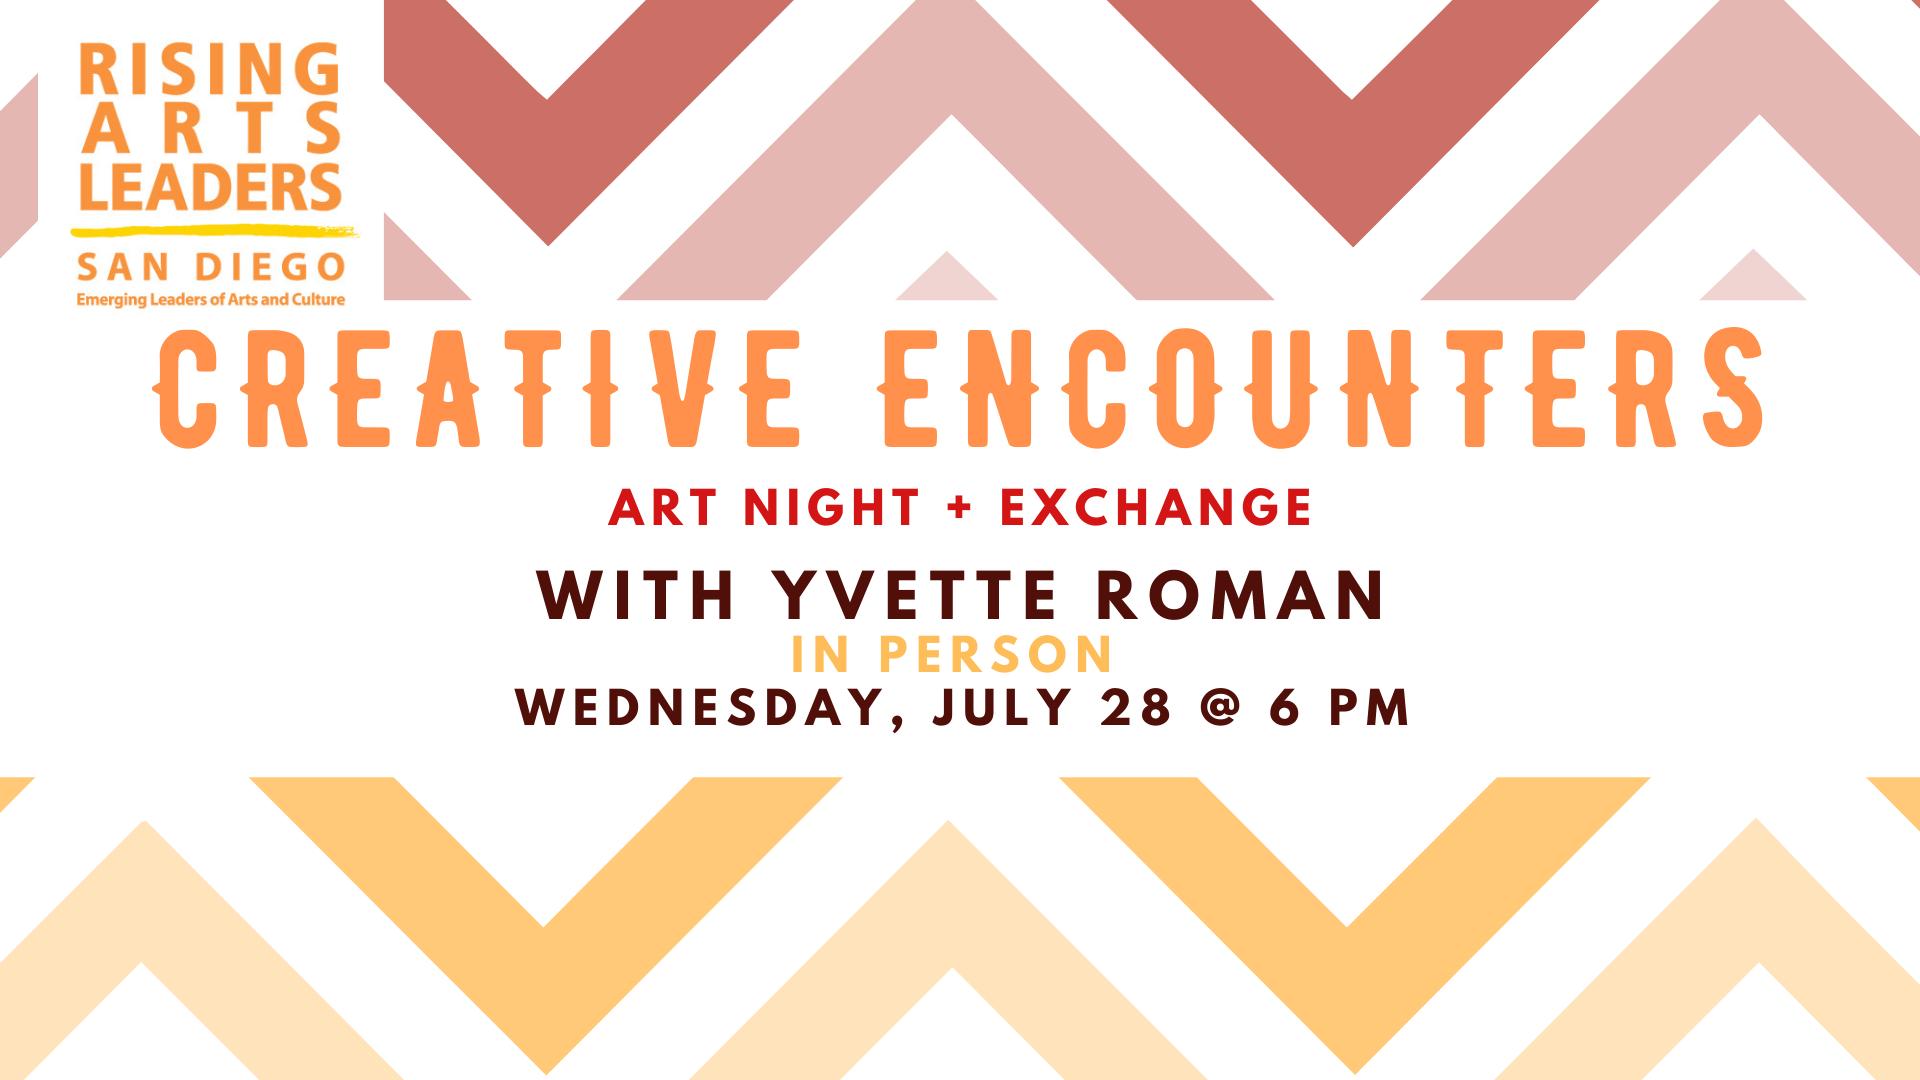 Creative Encounters